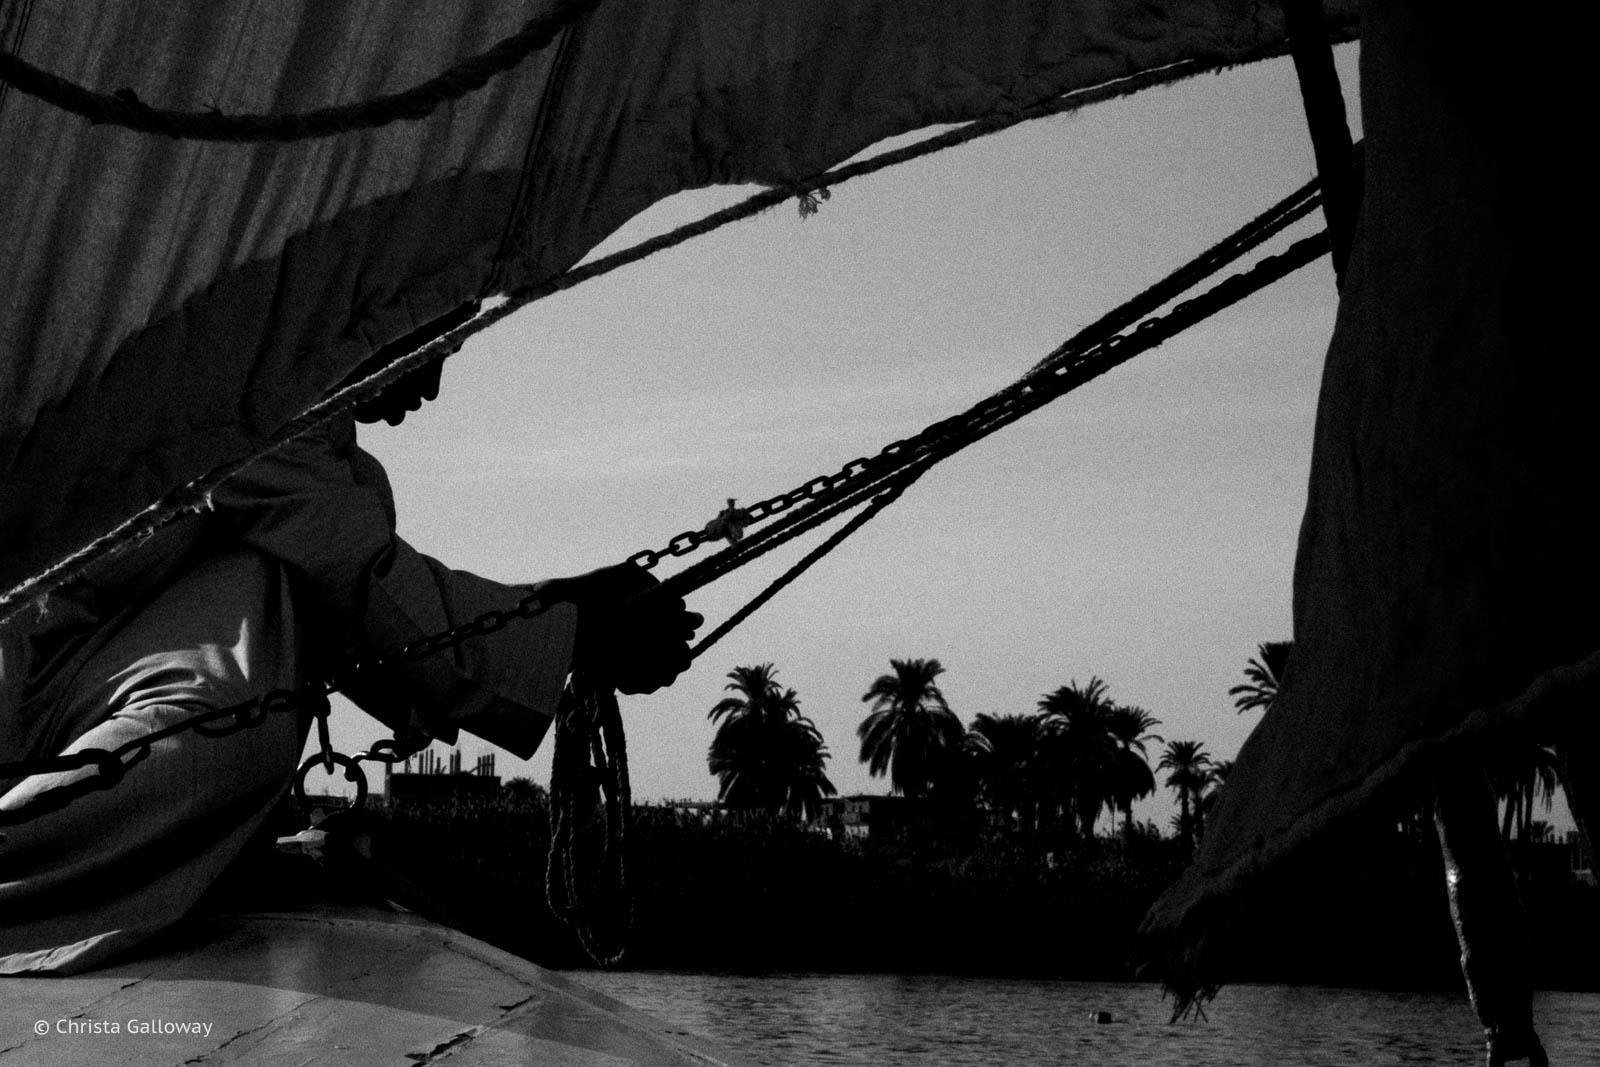 felucca-sailing-trip-nile-ckgalloway-3406.jpg